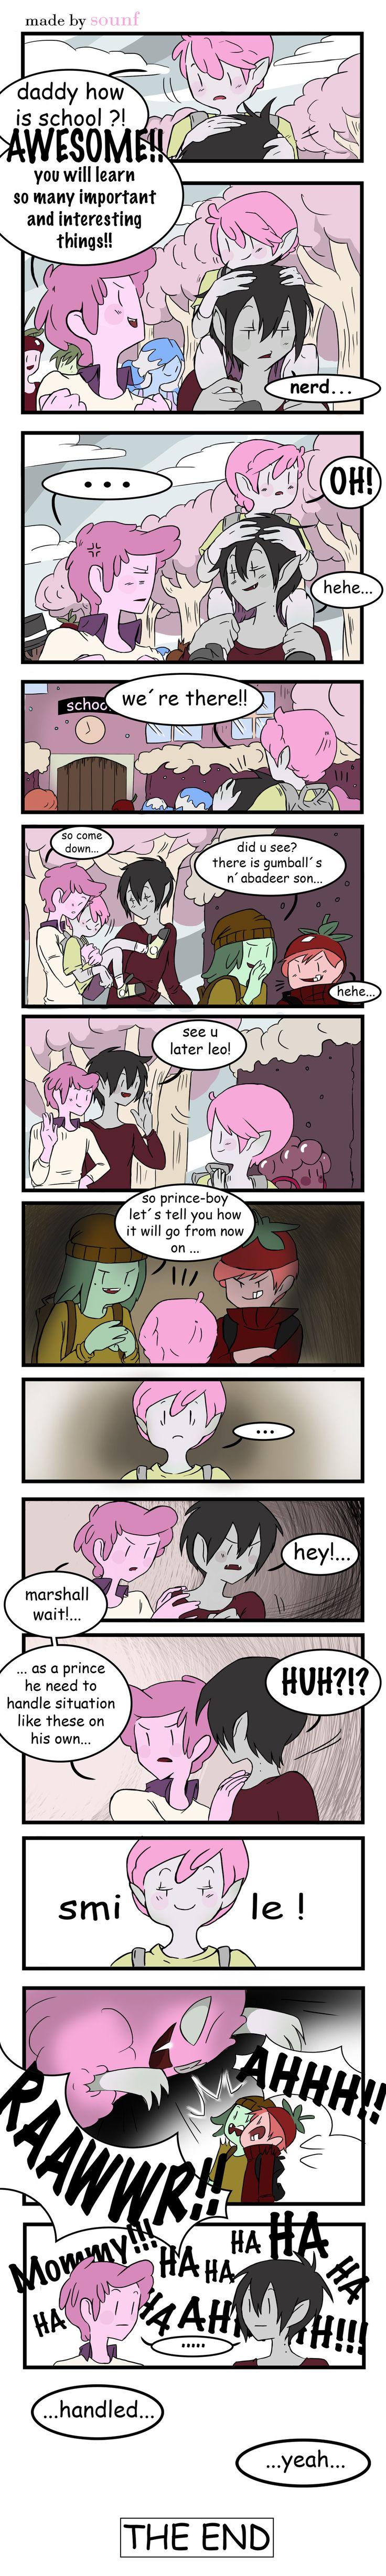 comic 7 by Sounf on DeviantArt